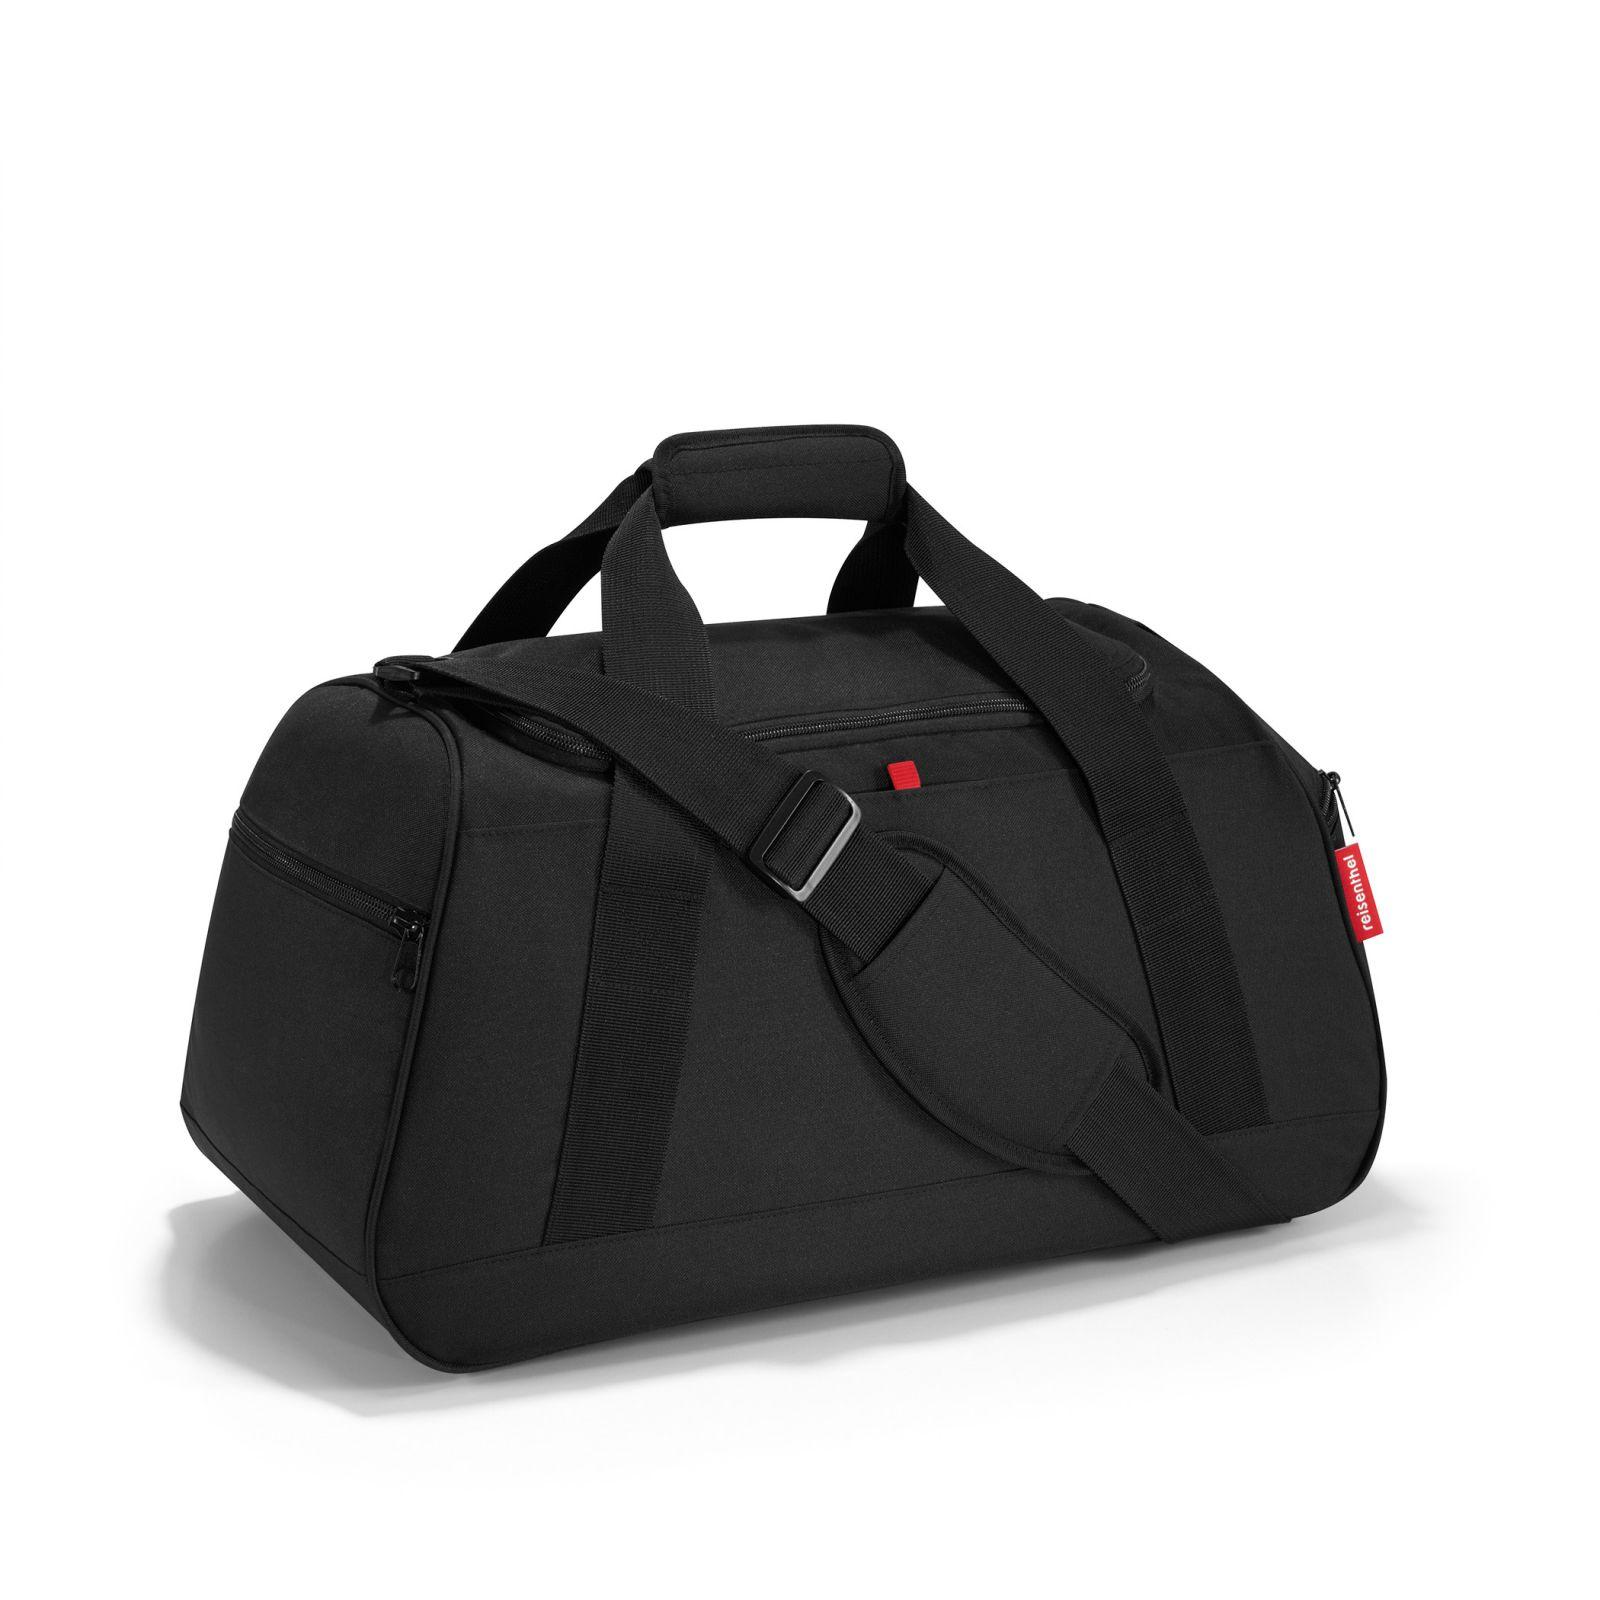 Reisenthel ActivityBag Black E-batoh